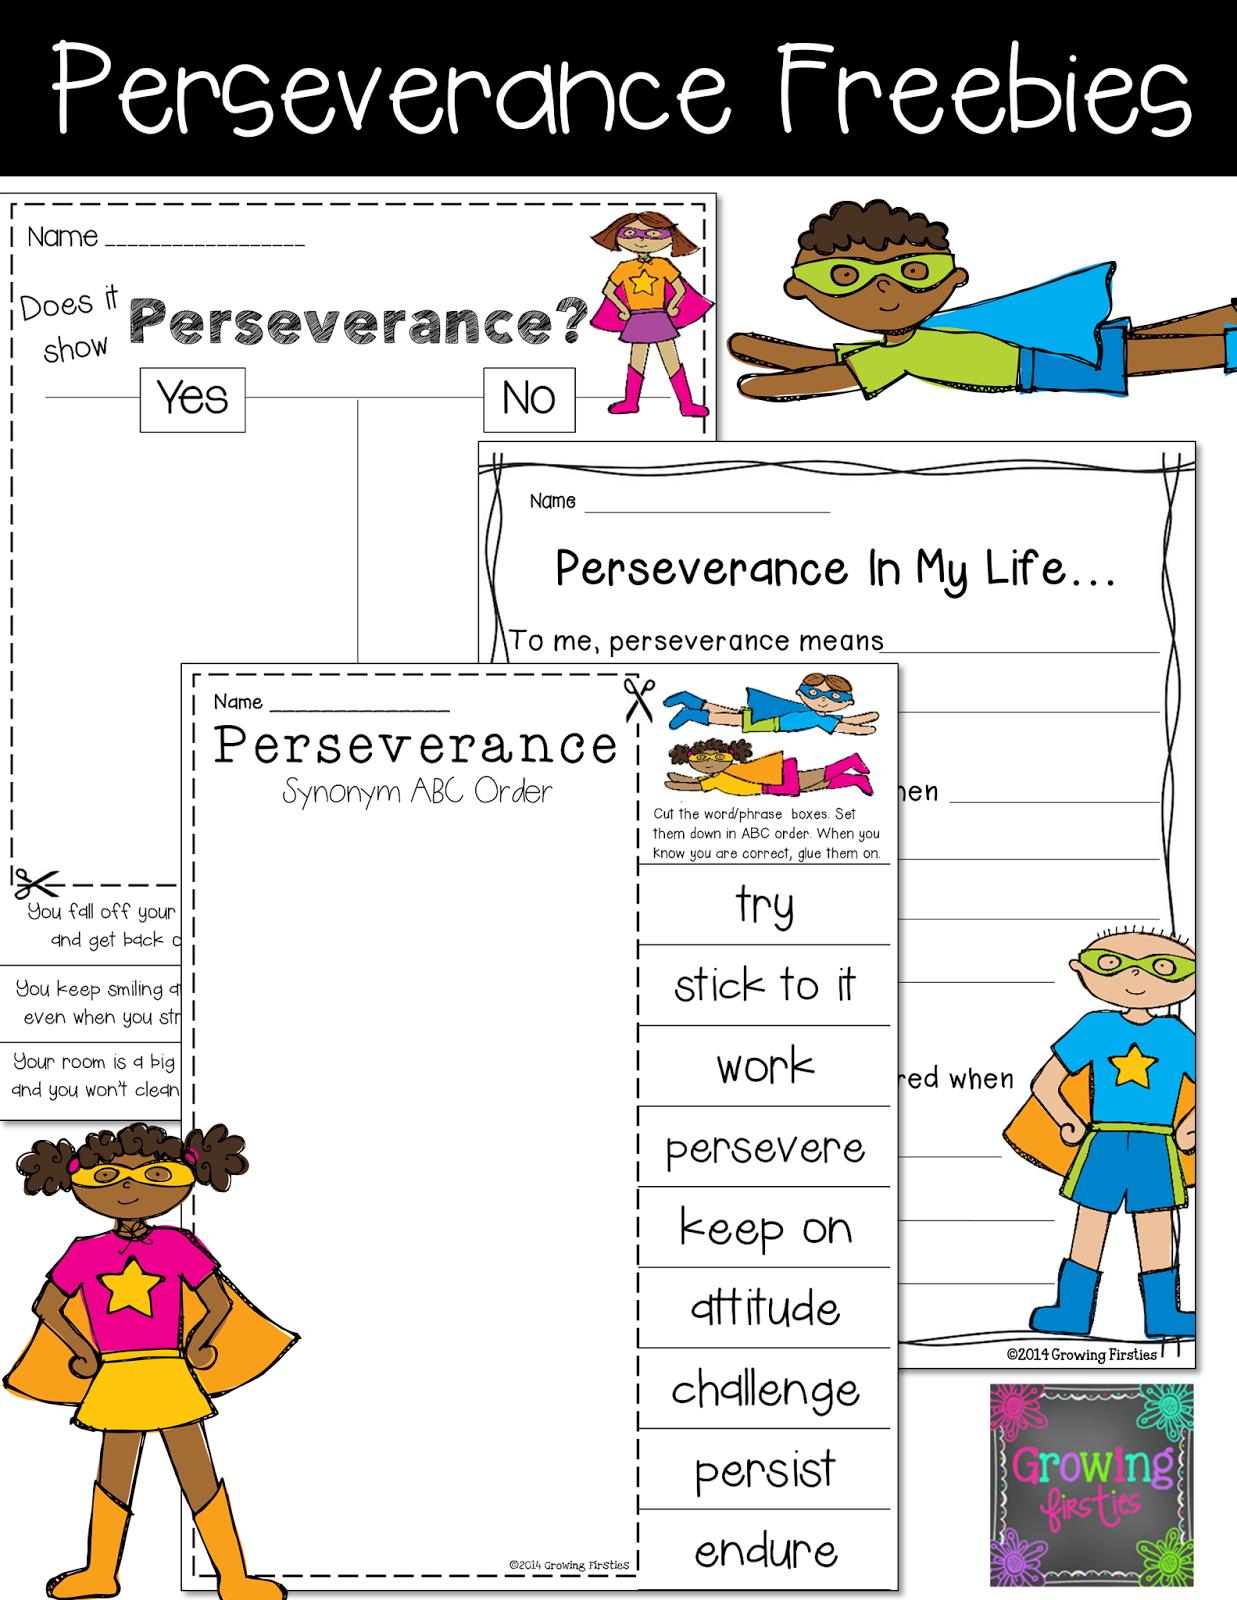 Perseverance | Growth mindset classroom, Growth mindset ...